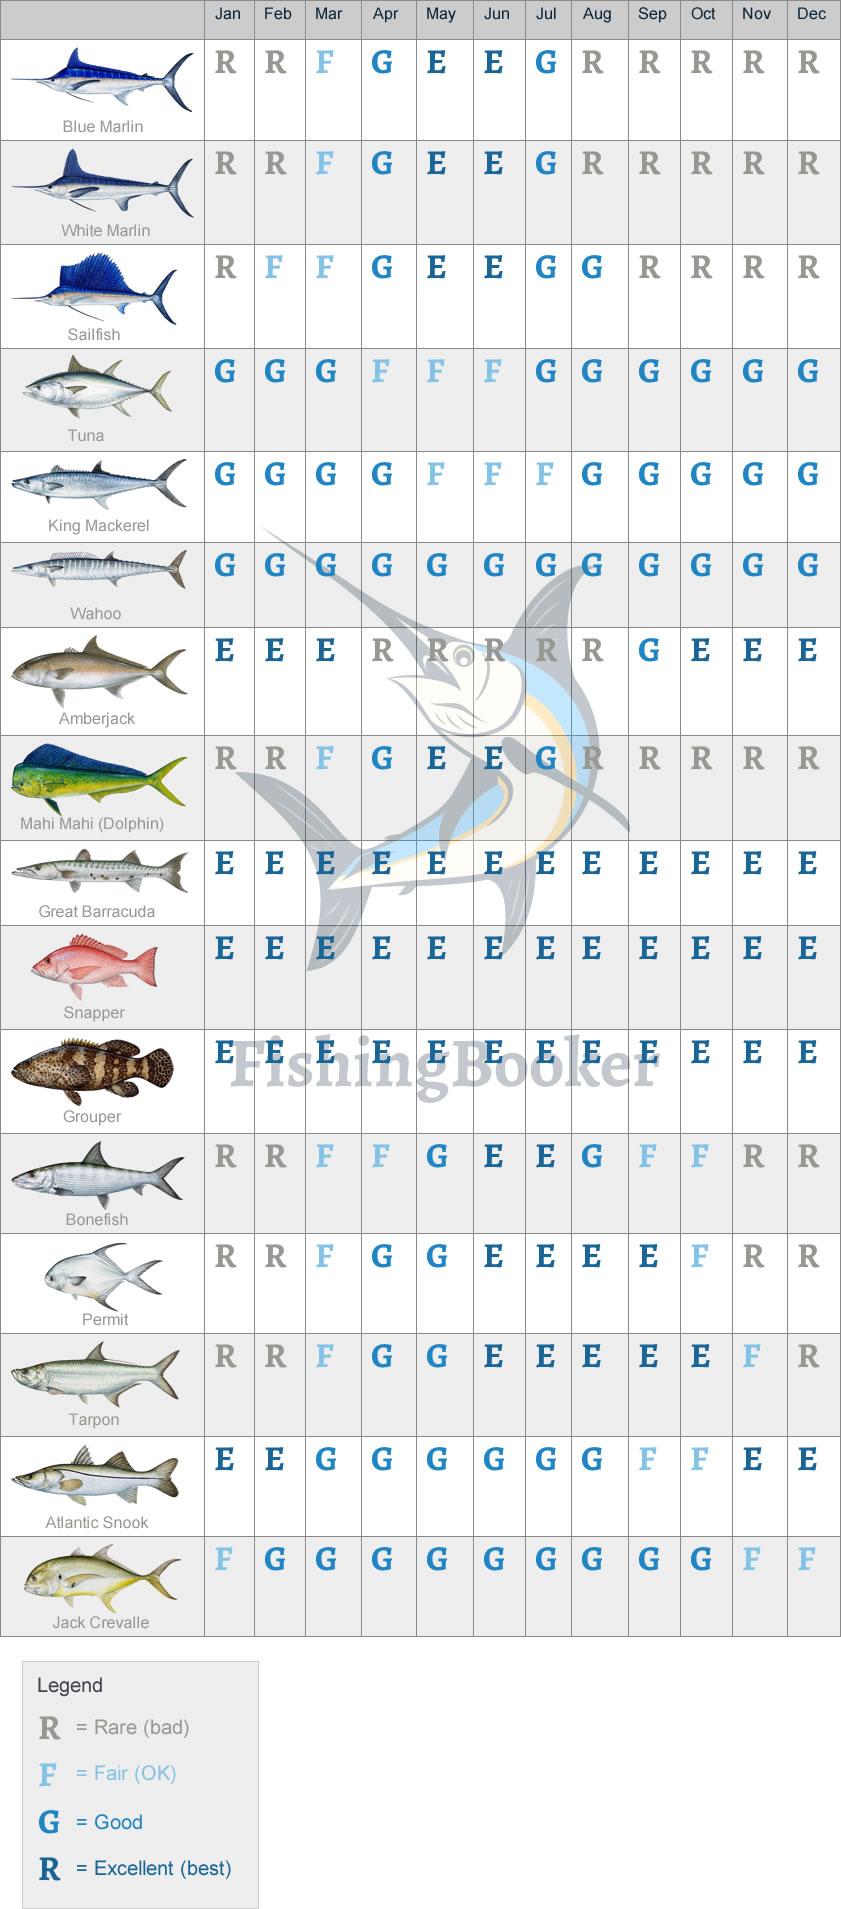 Fishing seasons calendar for Riviera Maya, Cancun, Cozumel and Playa del Carmen